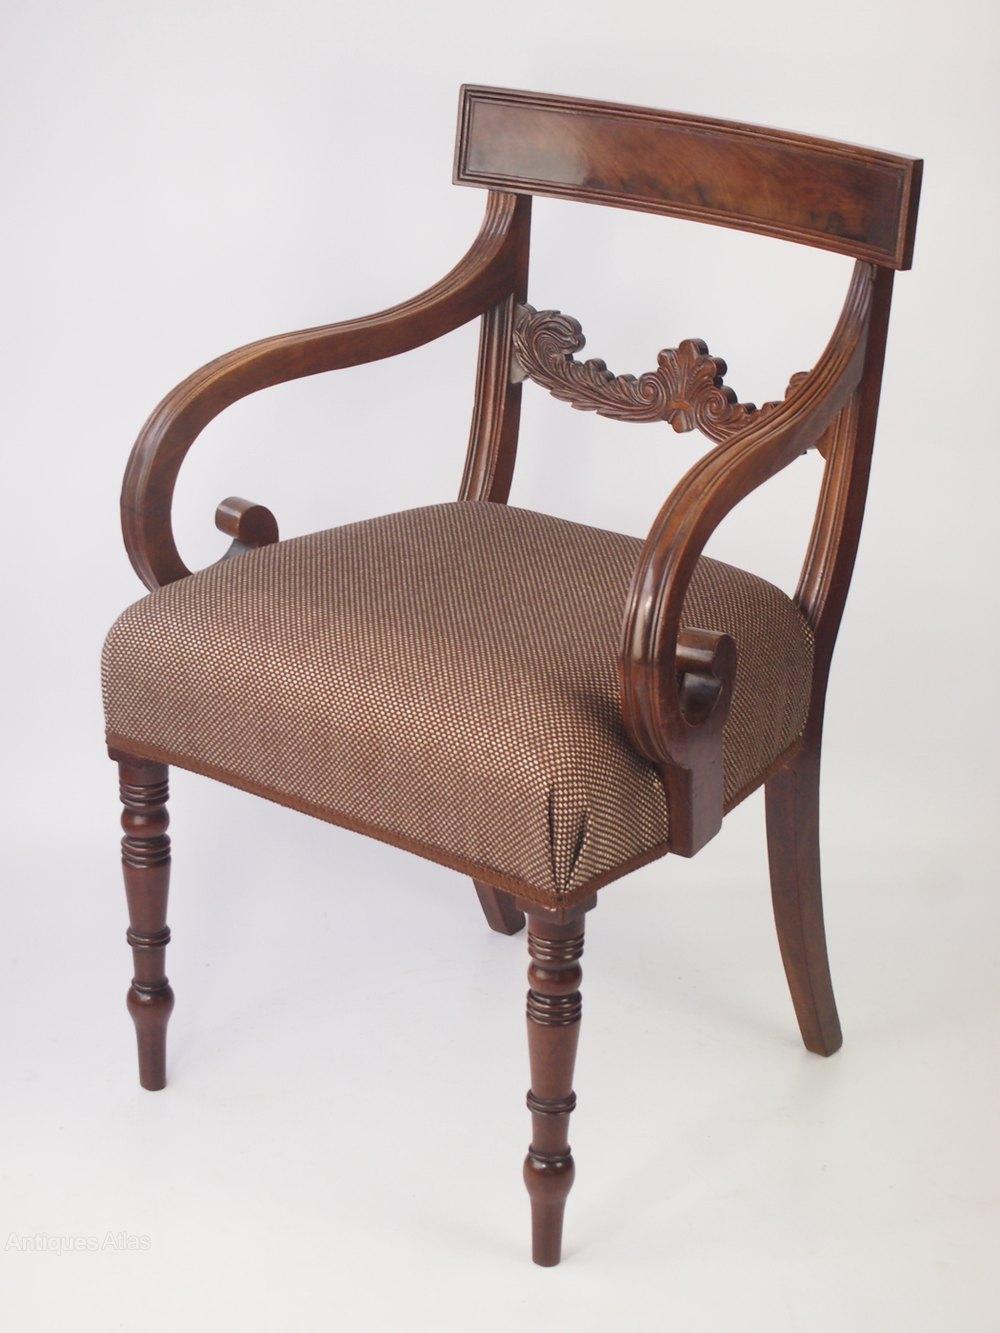 Antique regency mahogany desk chair antiques atlas for Antique office chair